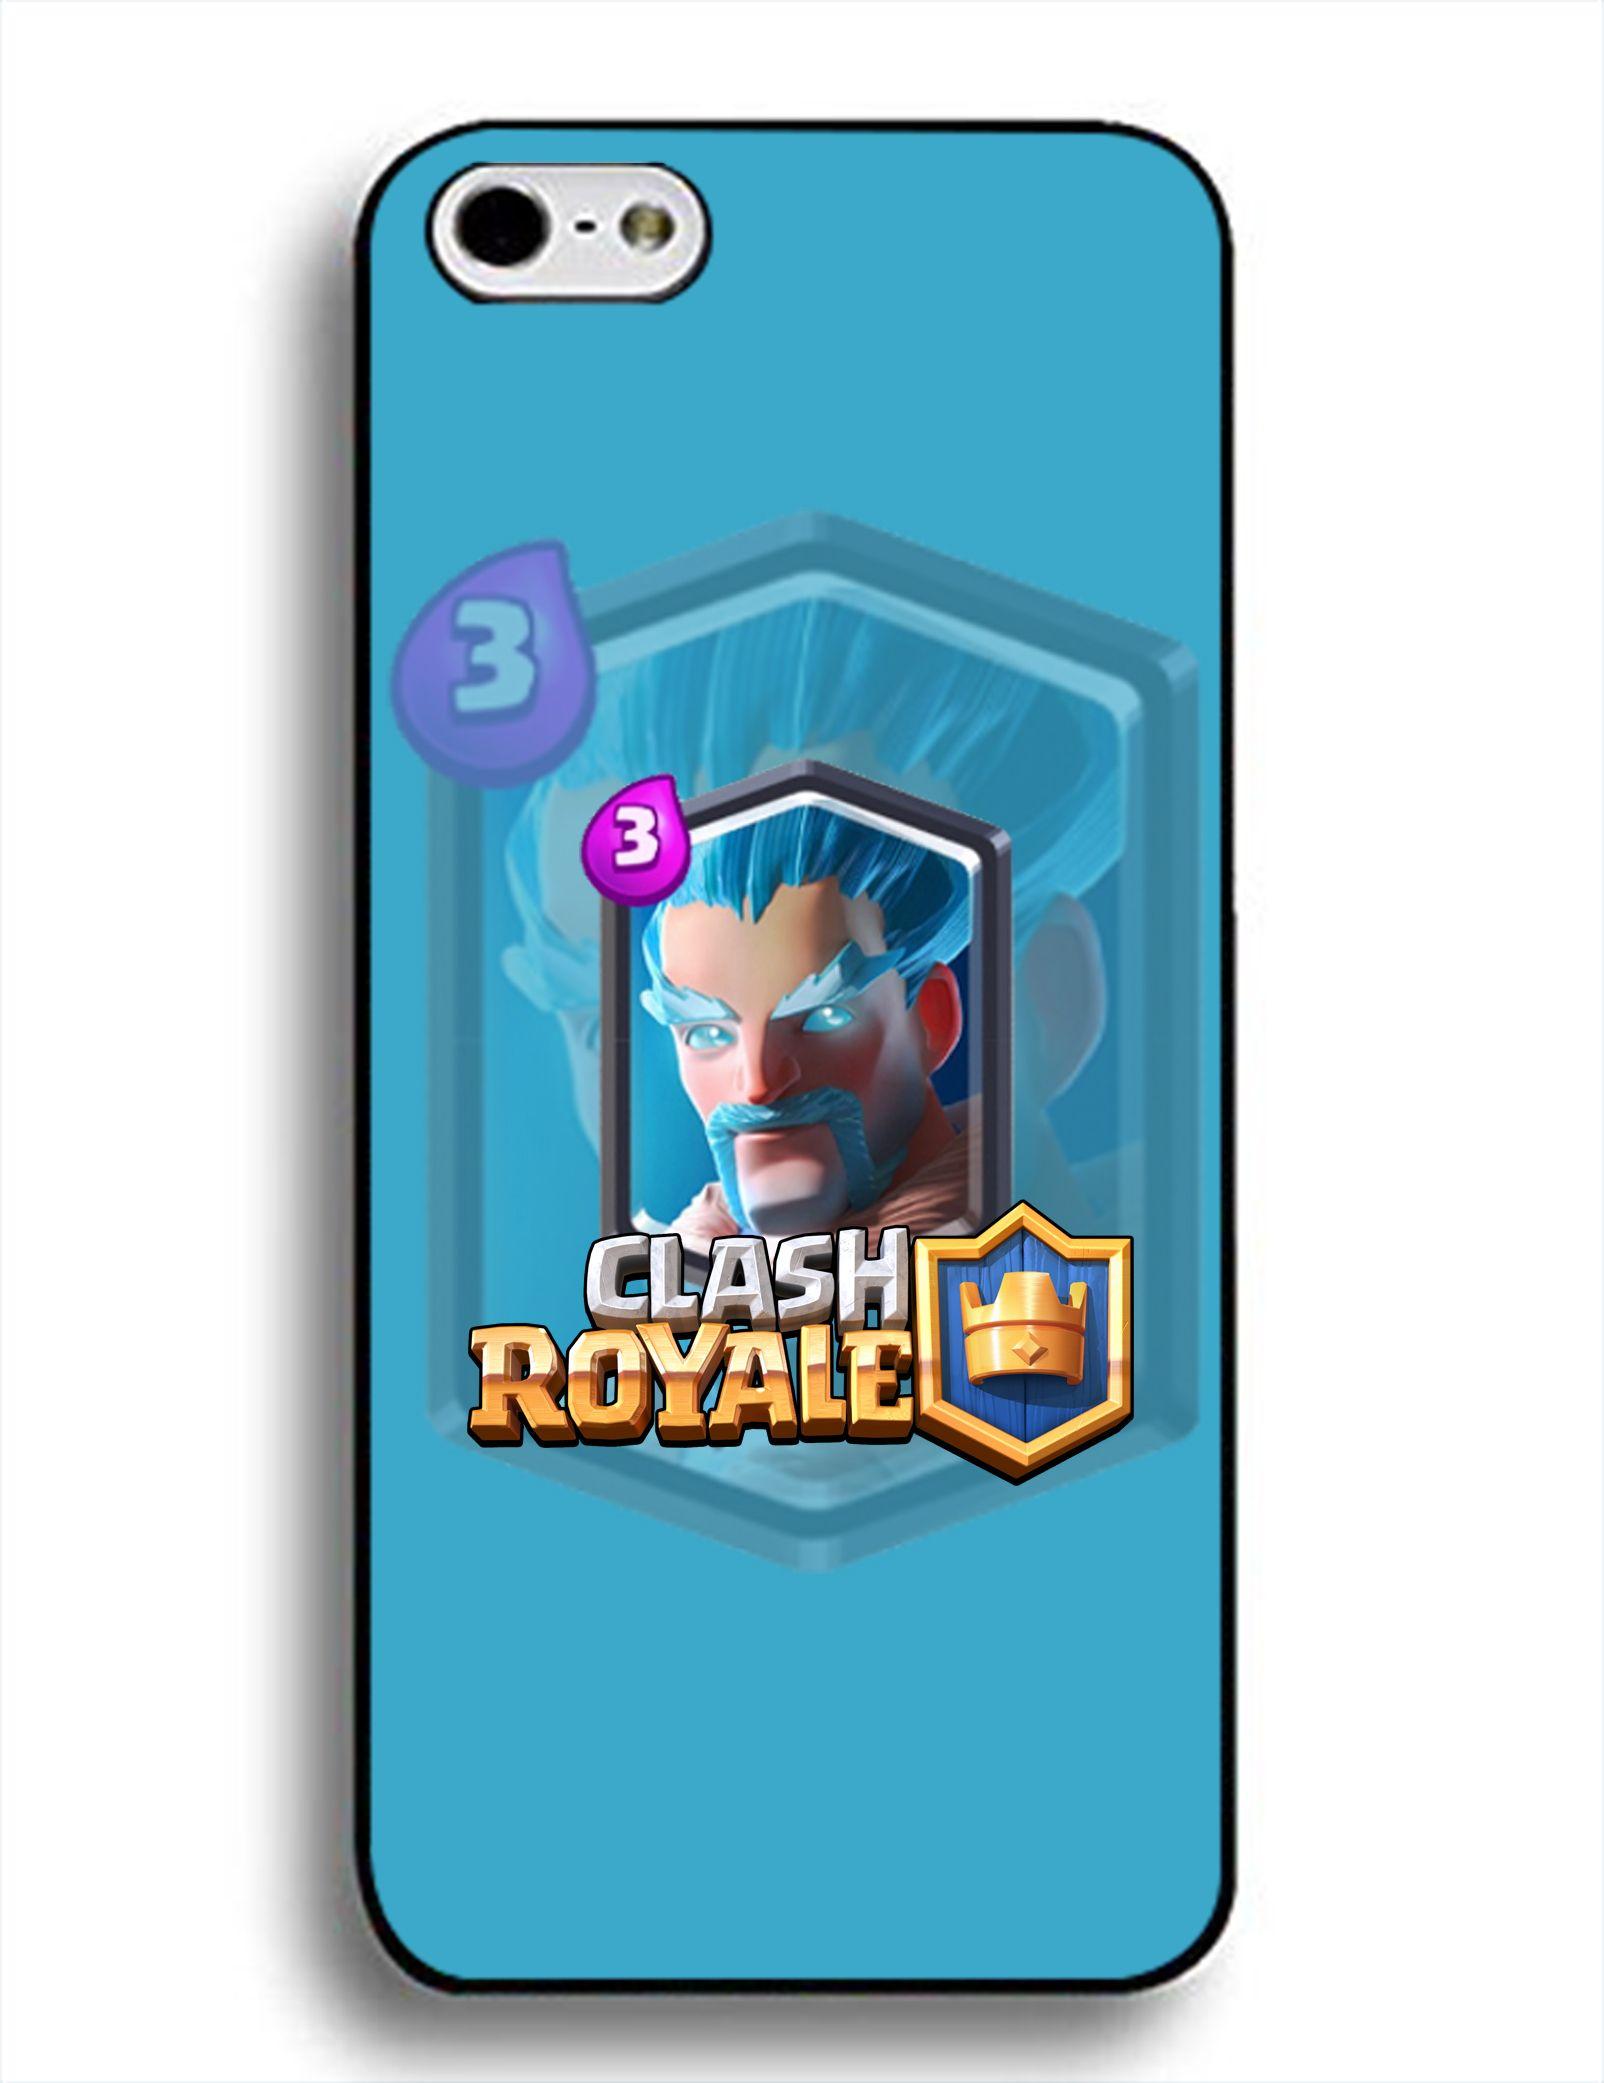 40 Clash royal ideas | iphone technology, clash royale, custom boxes